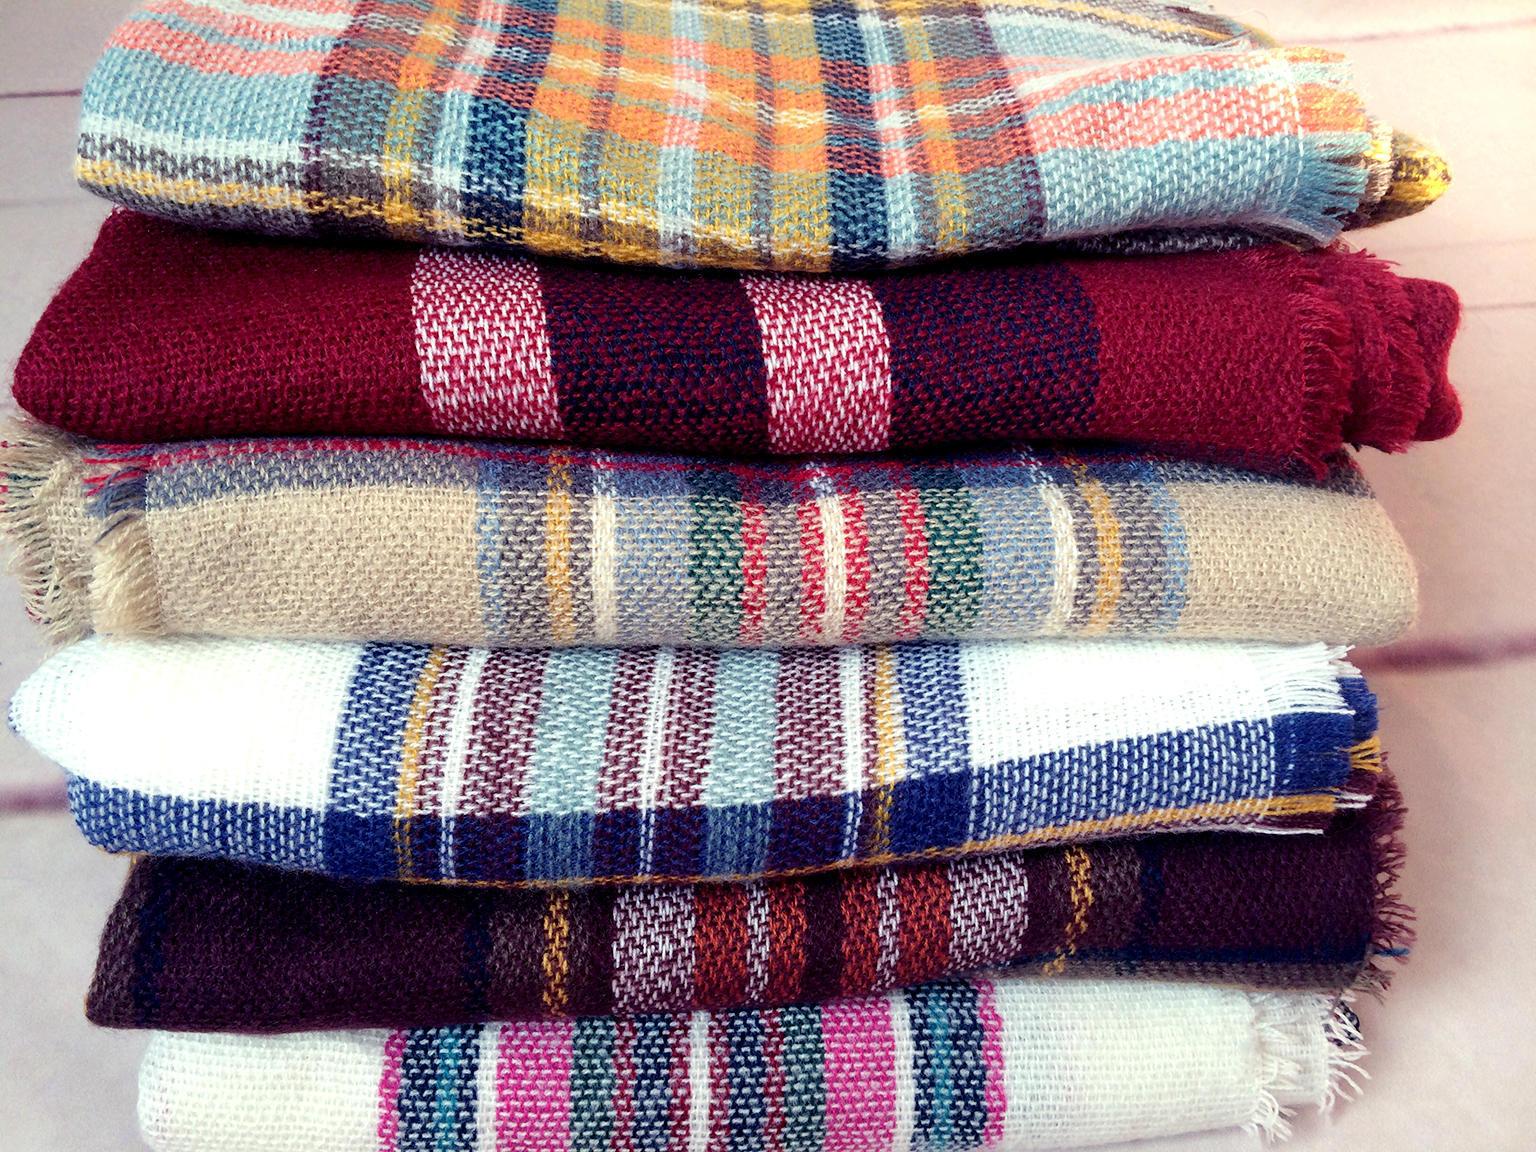 Winter Scarf 2016 font b Tartan b font Plaid Cashmere Scarf Pashmina New Designer Blanket Scarf